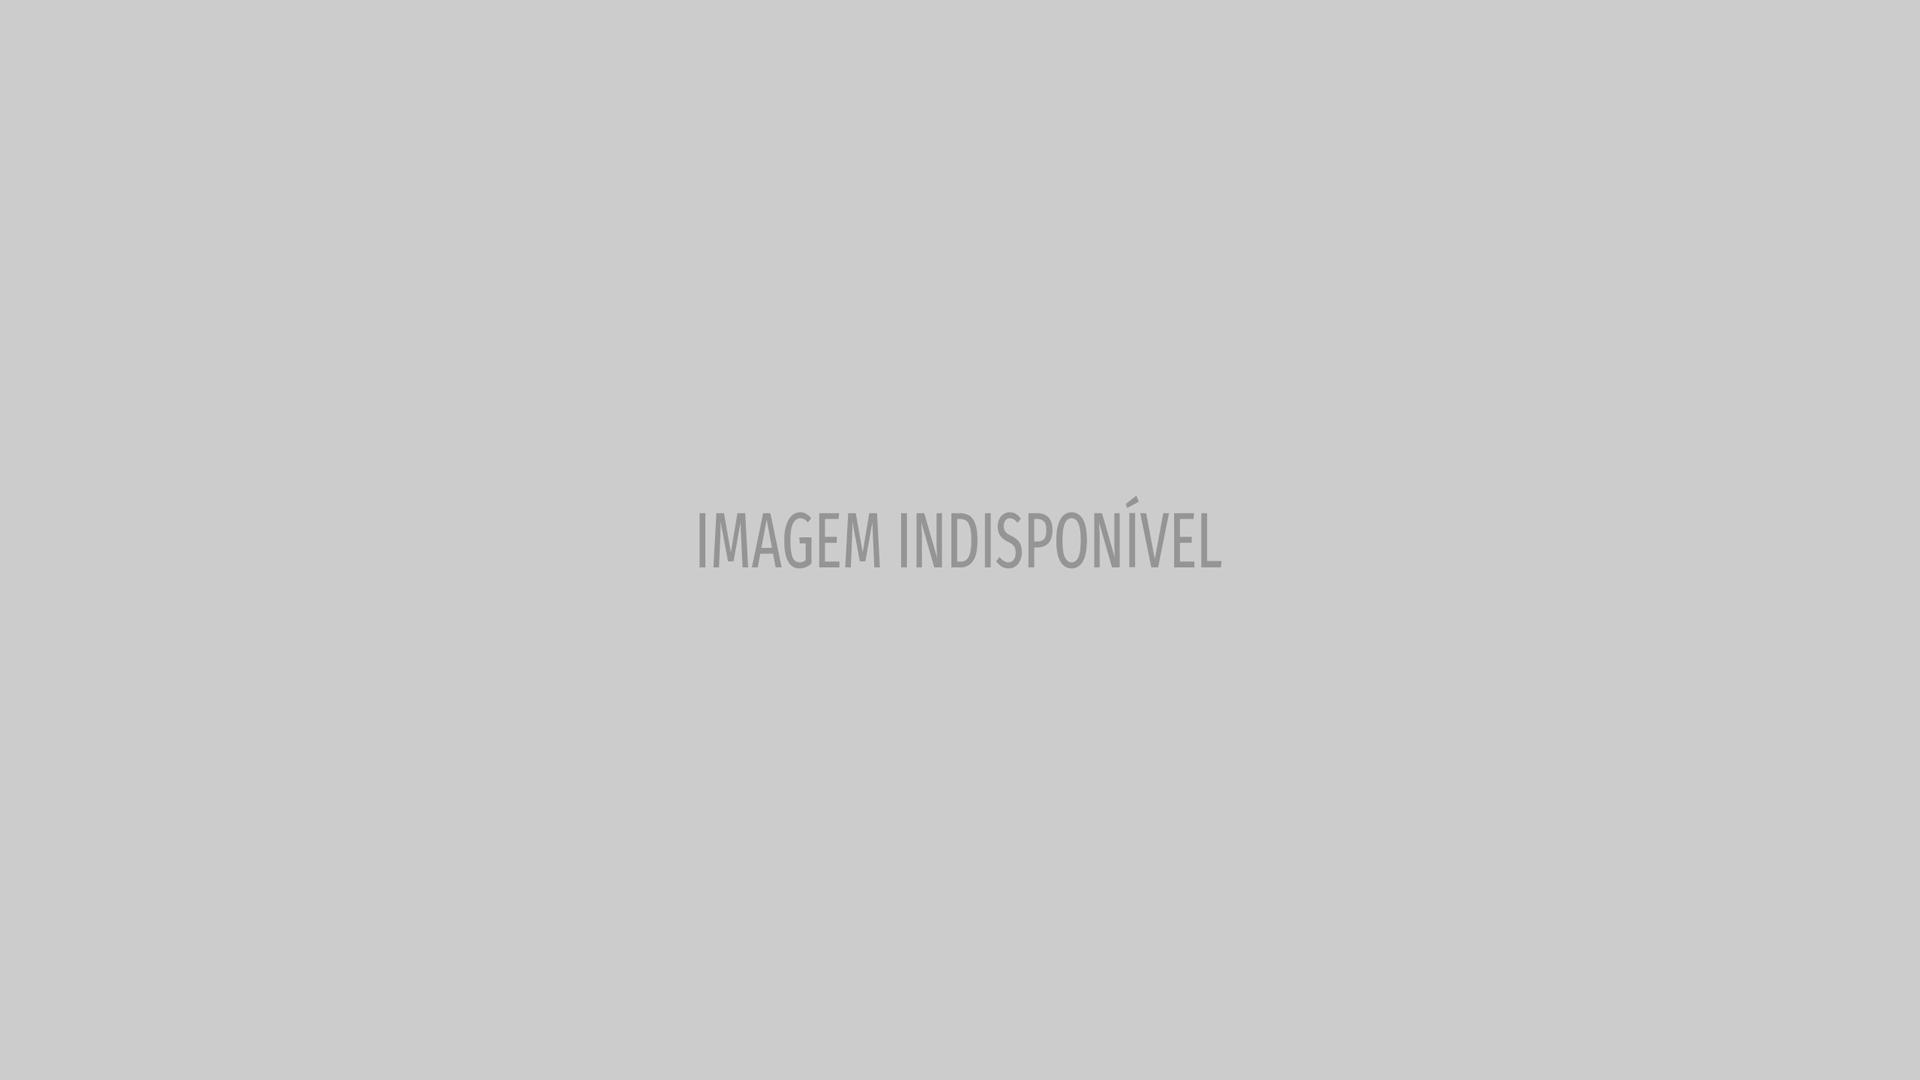 Sem Lady Gaga, Pabllo Vittar 'bomba' em palco menor no Rock in Rio